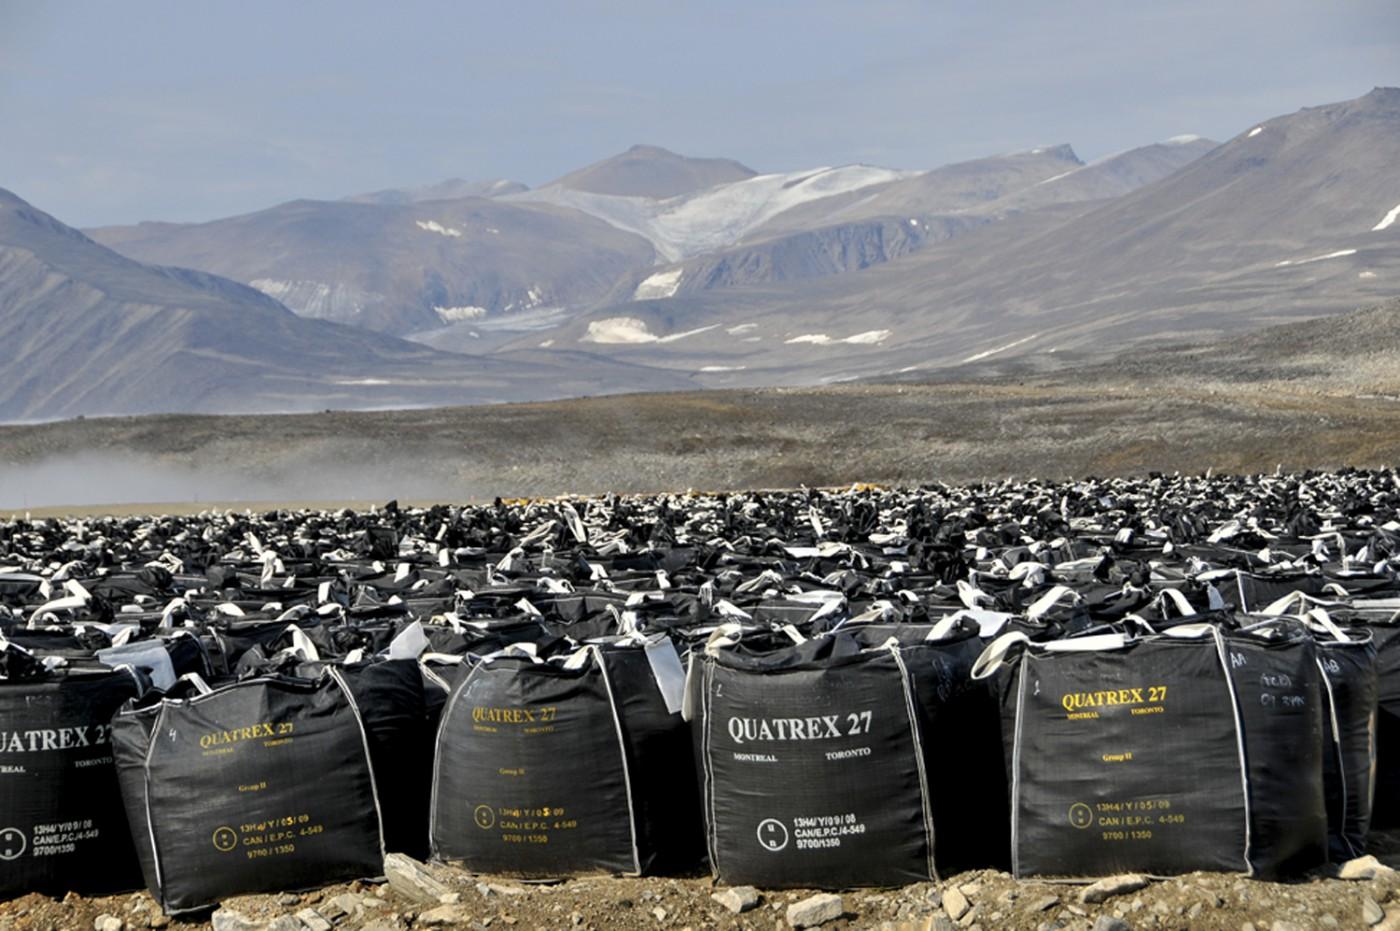 Margo Pfeiff, </span><span><em>Contaminated soil bags at Lower Base, Cape Dyer</em>, </span><span>2013. © Margo Pfeiff